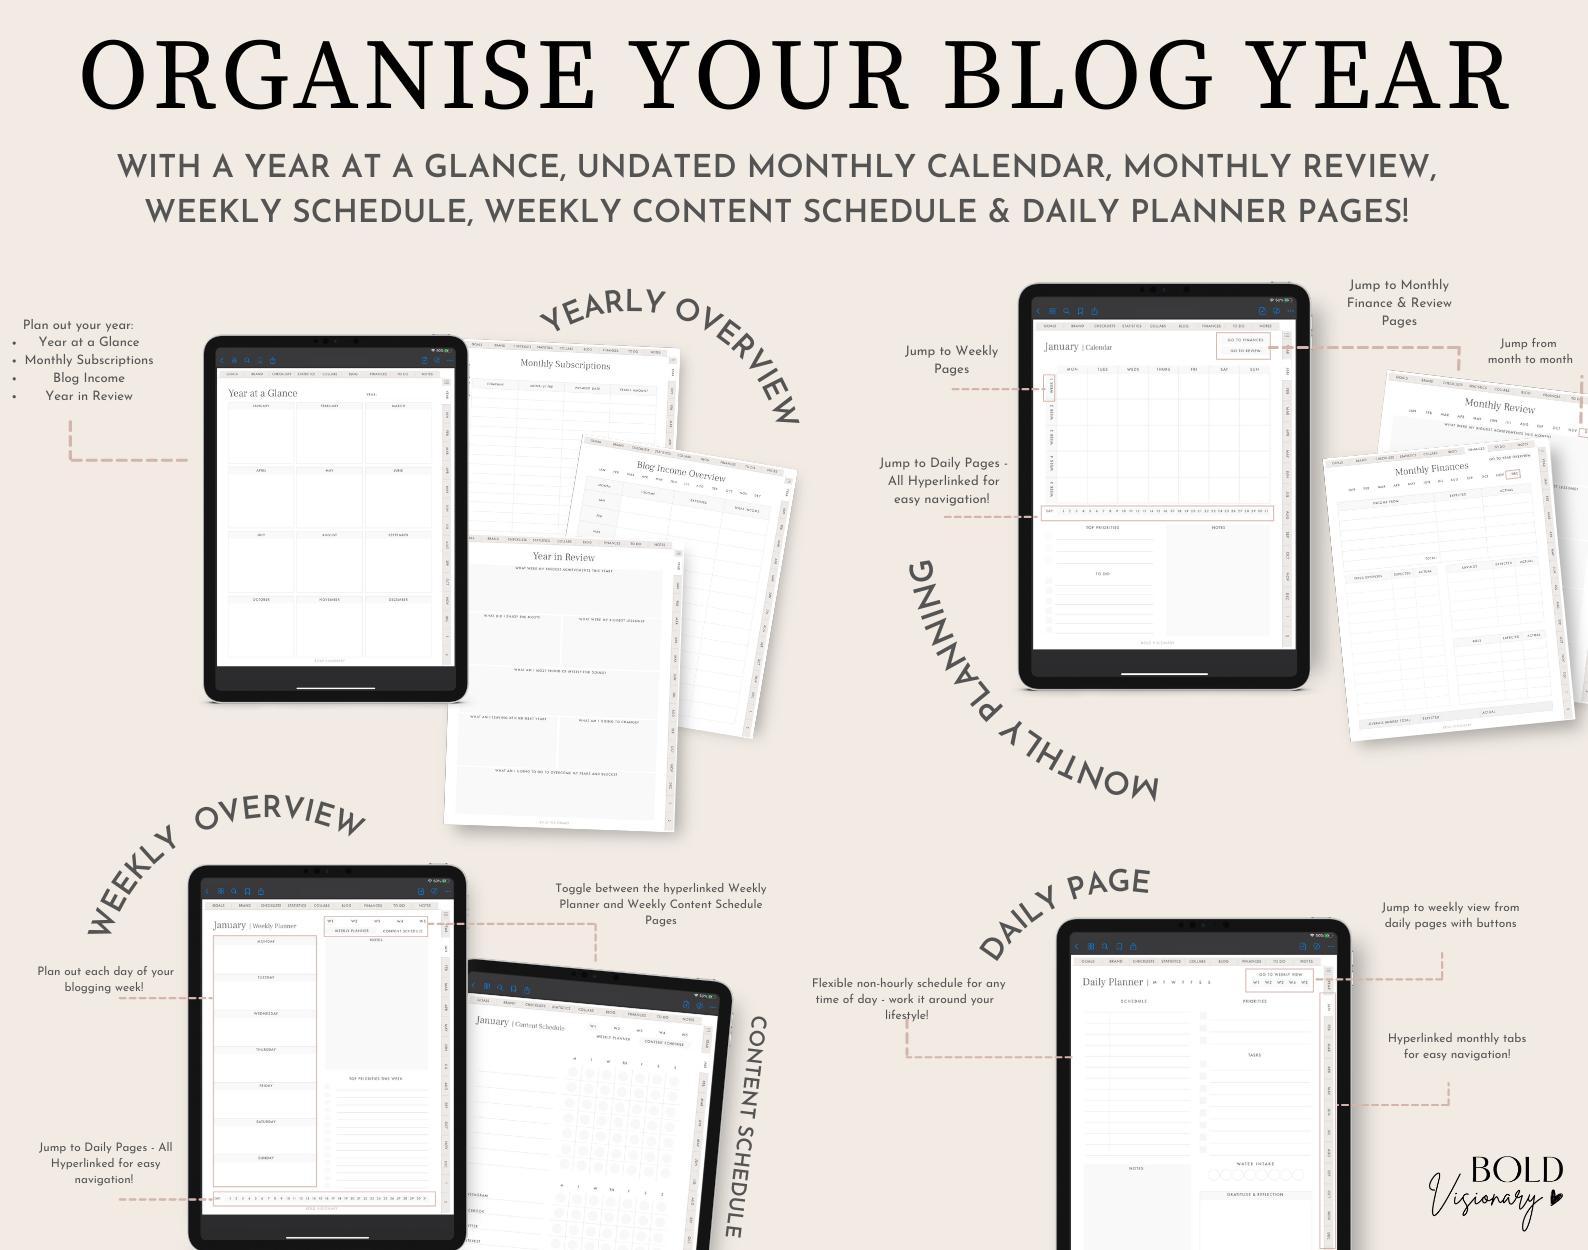 3Organise-Year-Bold-Visionary-Digital-Blog-Planner